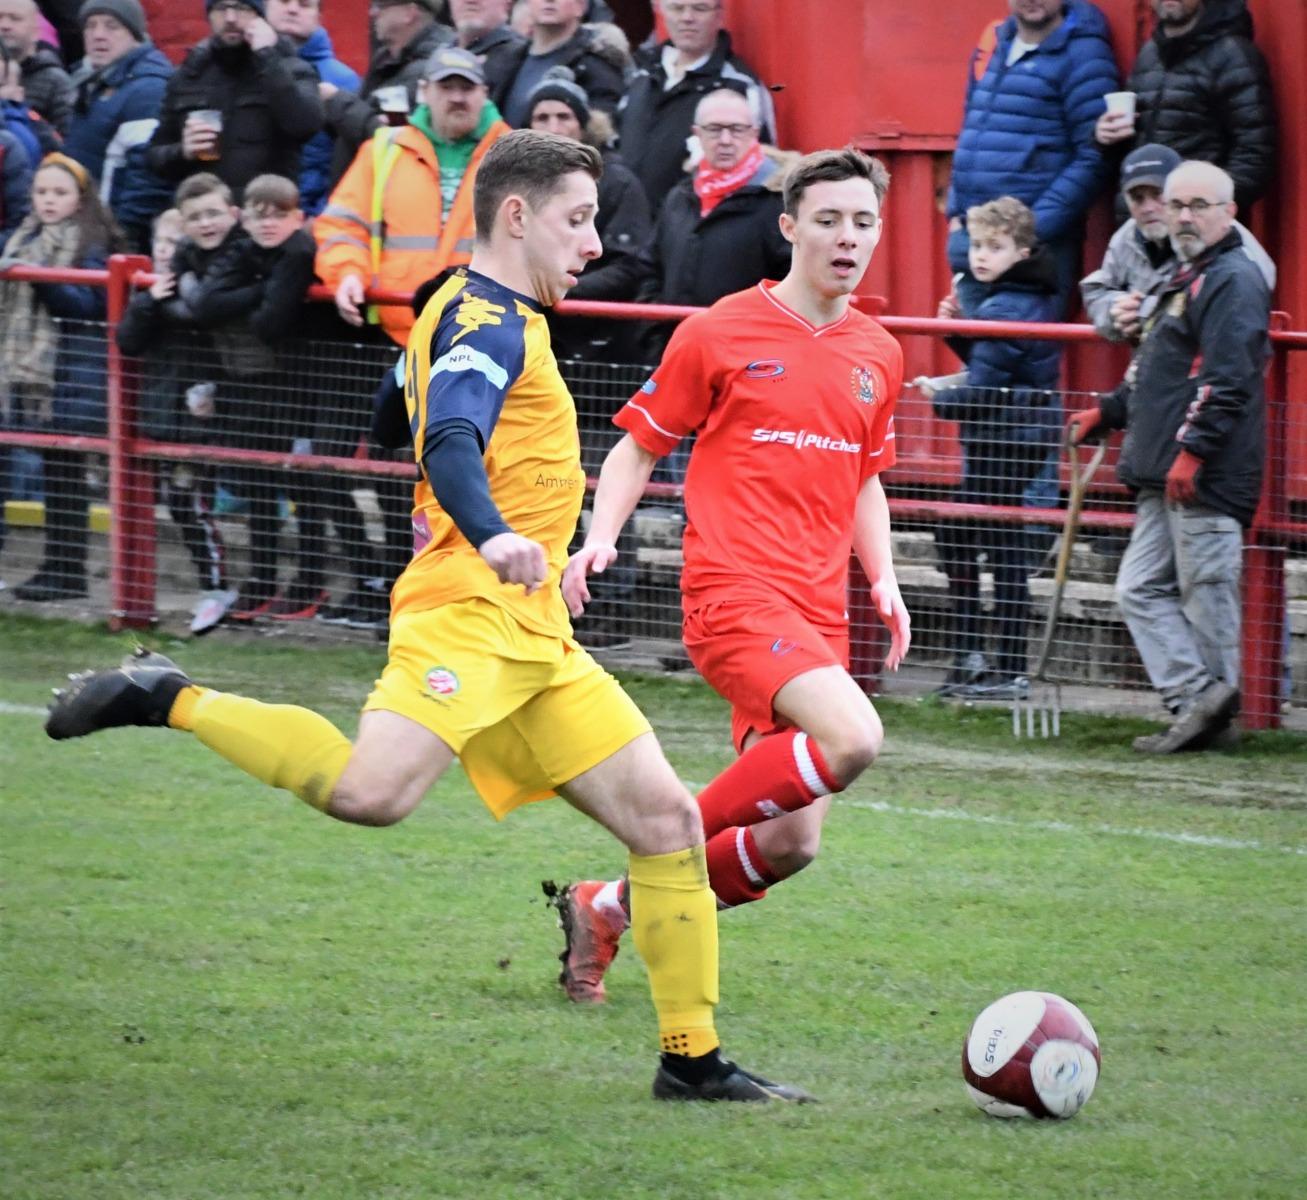 Workington-Reds-v-Trafford-Ben-Challis-3-scaled